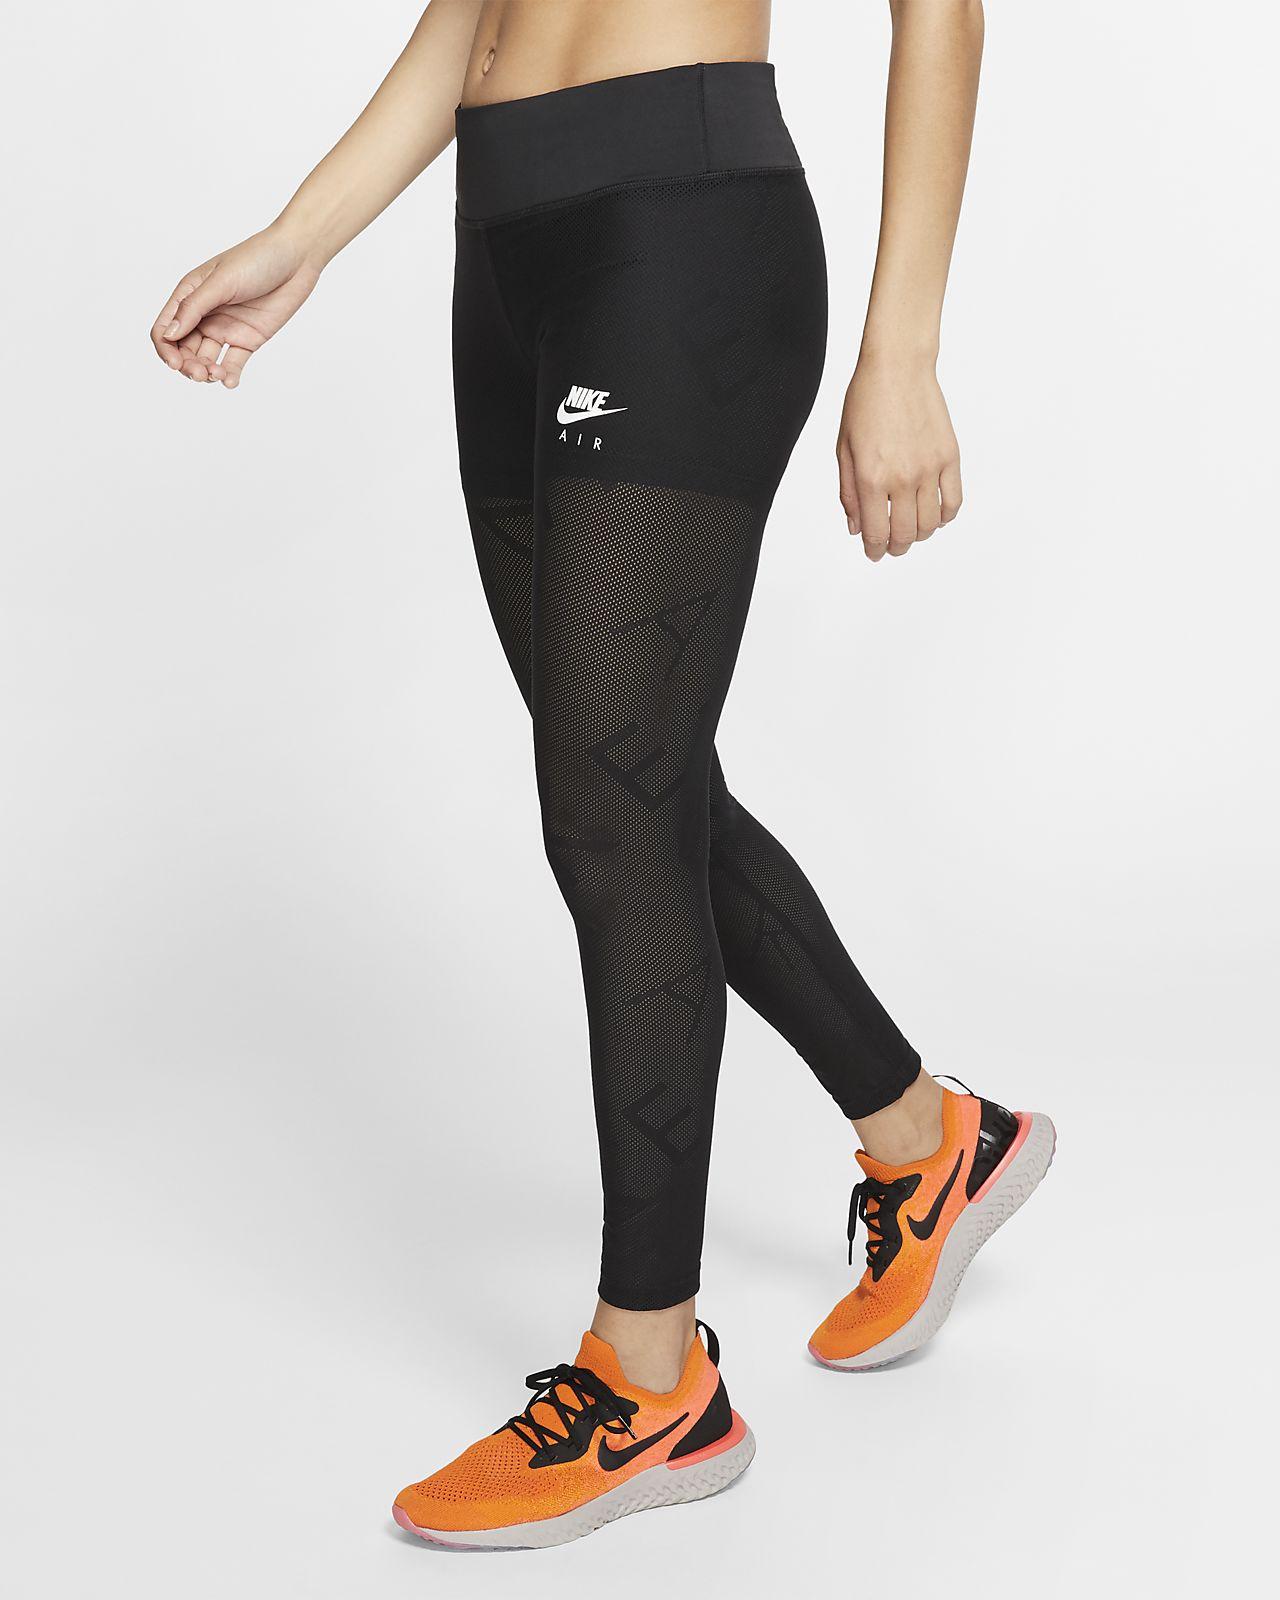 Nike Air Women's 7/8 Mesh Running Tights